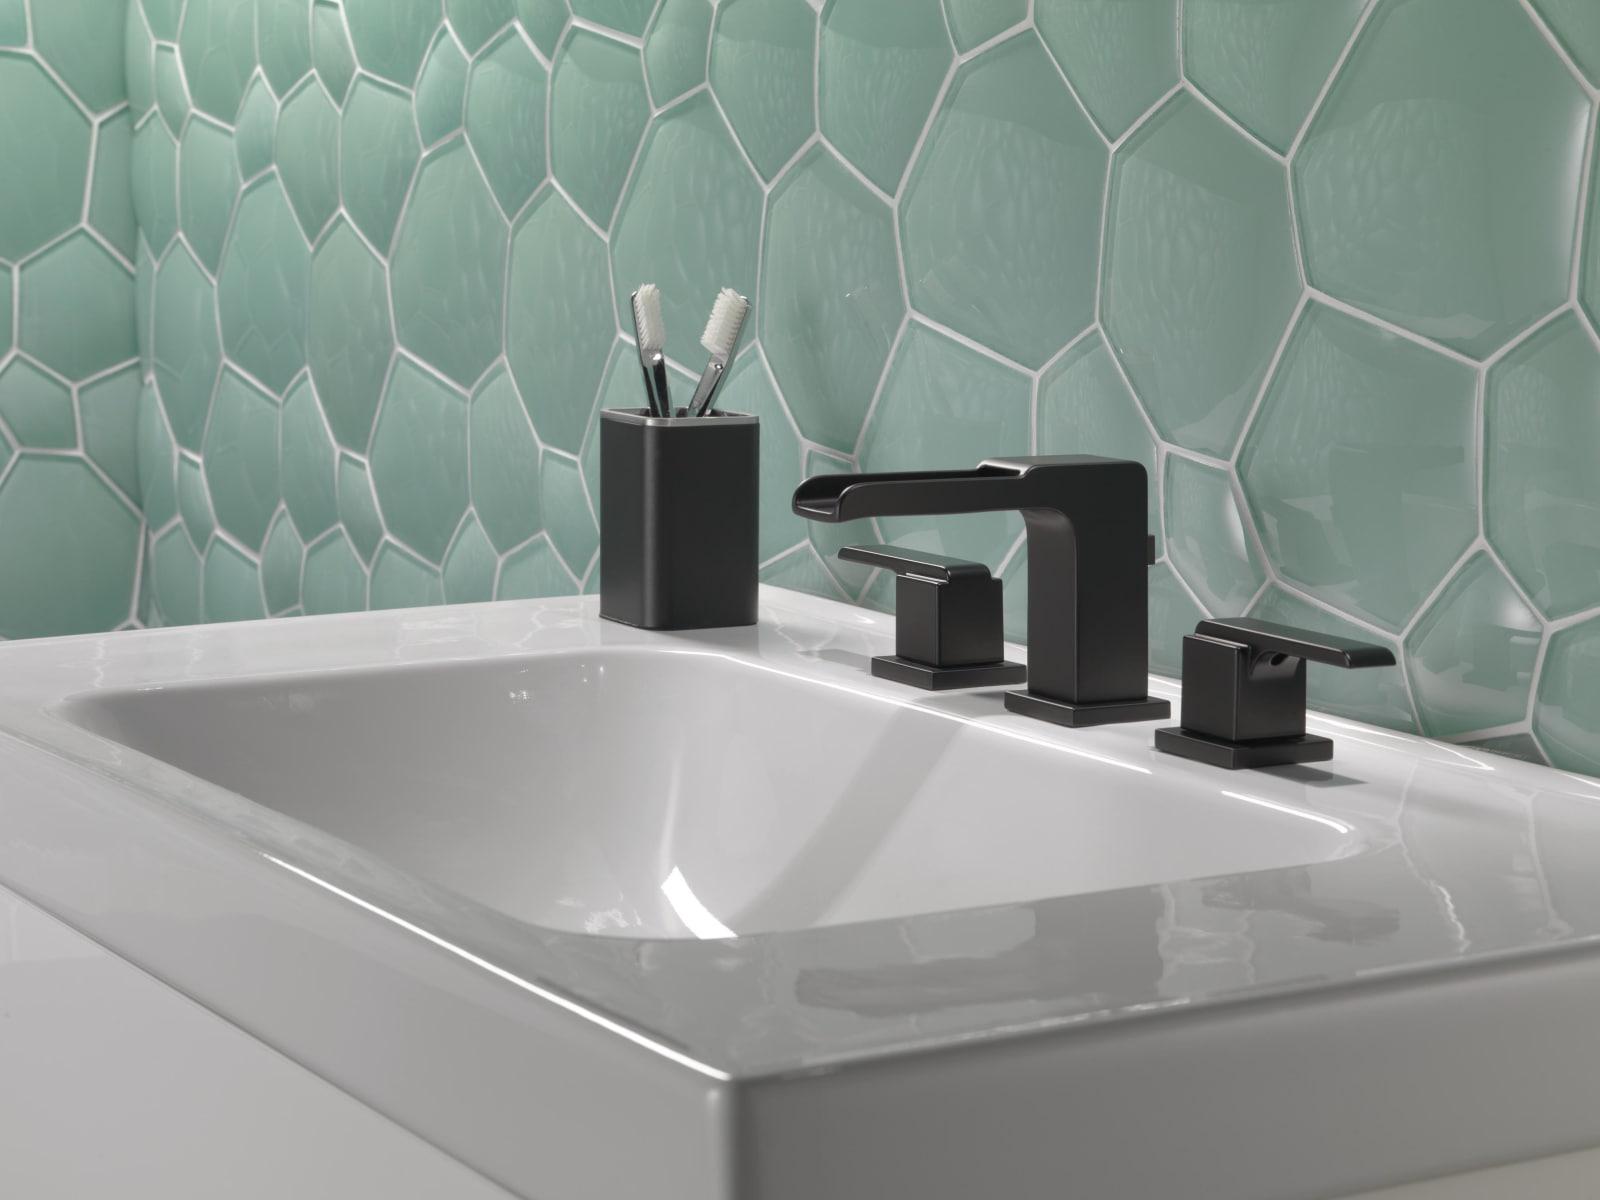 Delta 3568LF-MPU Chrome Ara 1.2 GPM Widespread Waterfall Bathroom ...